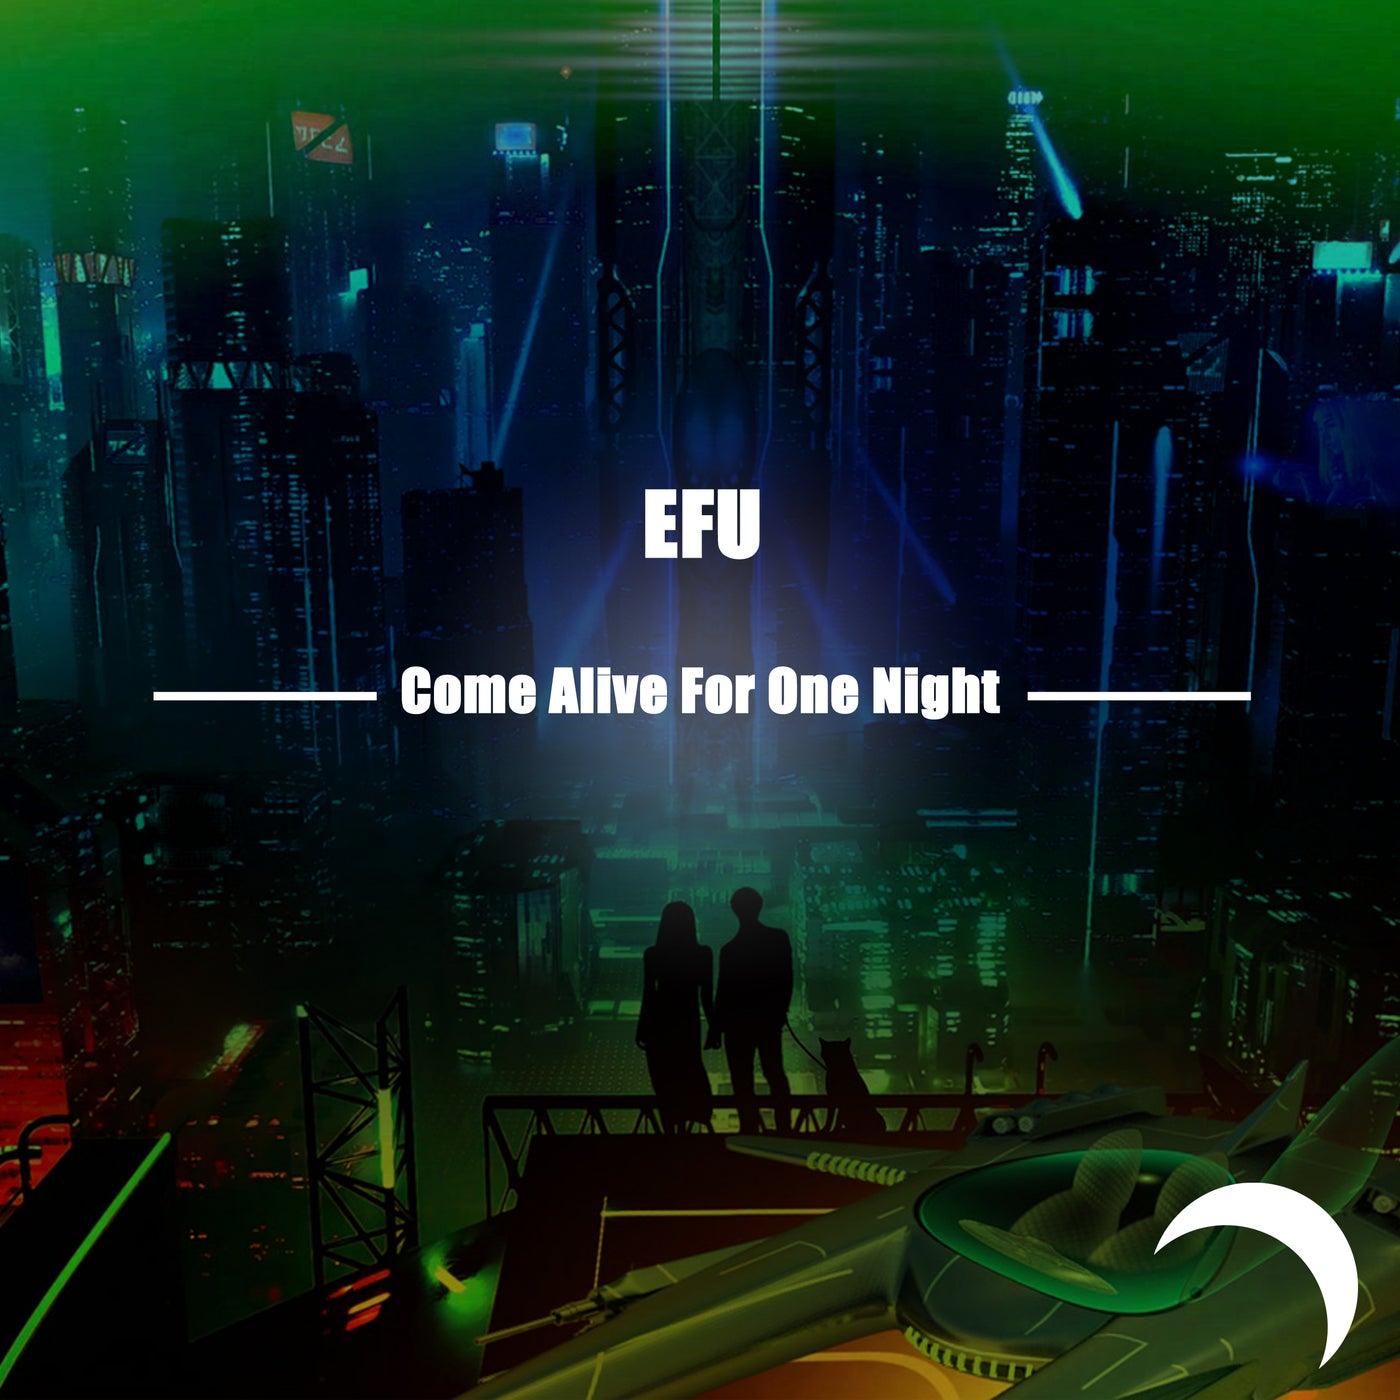 Come Alive For One Night (Original Mix)